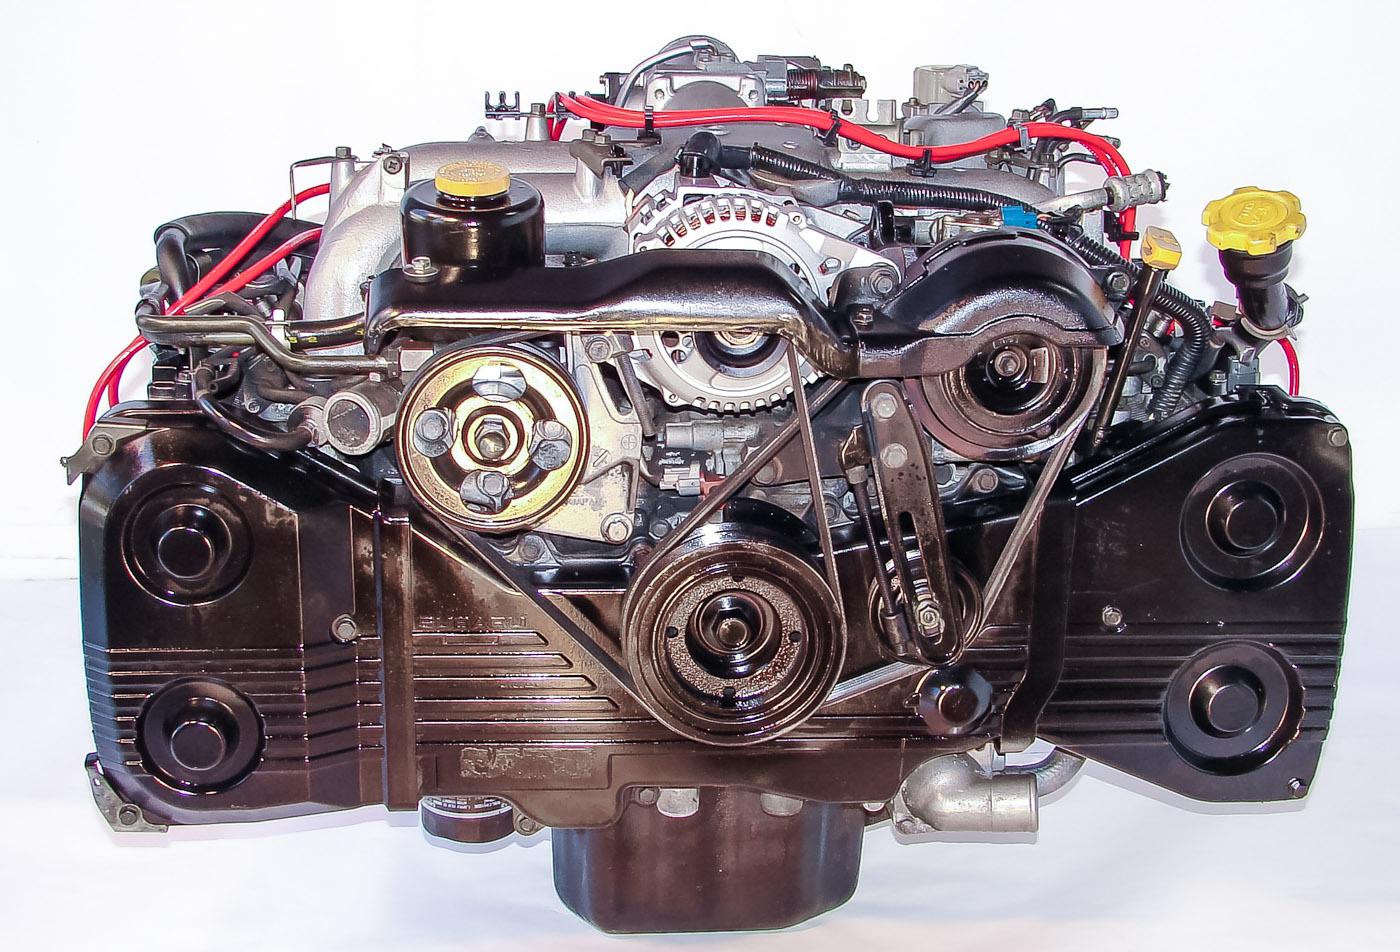 1996-1998 Subaru Legacy 2.5L DOHC Used Engine